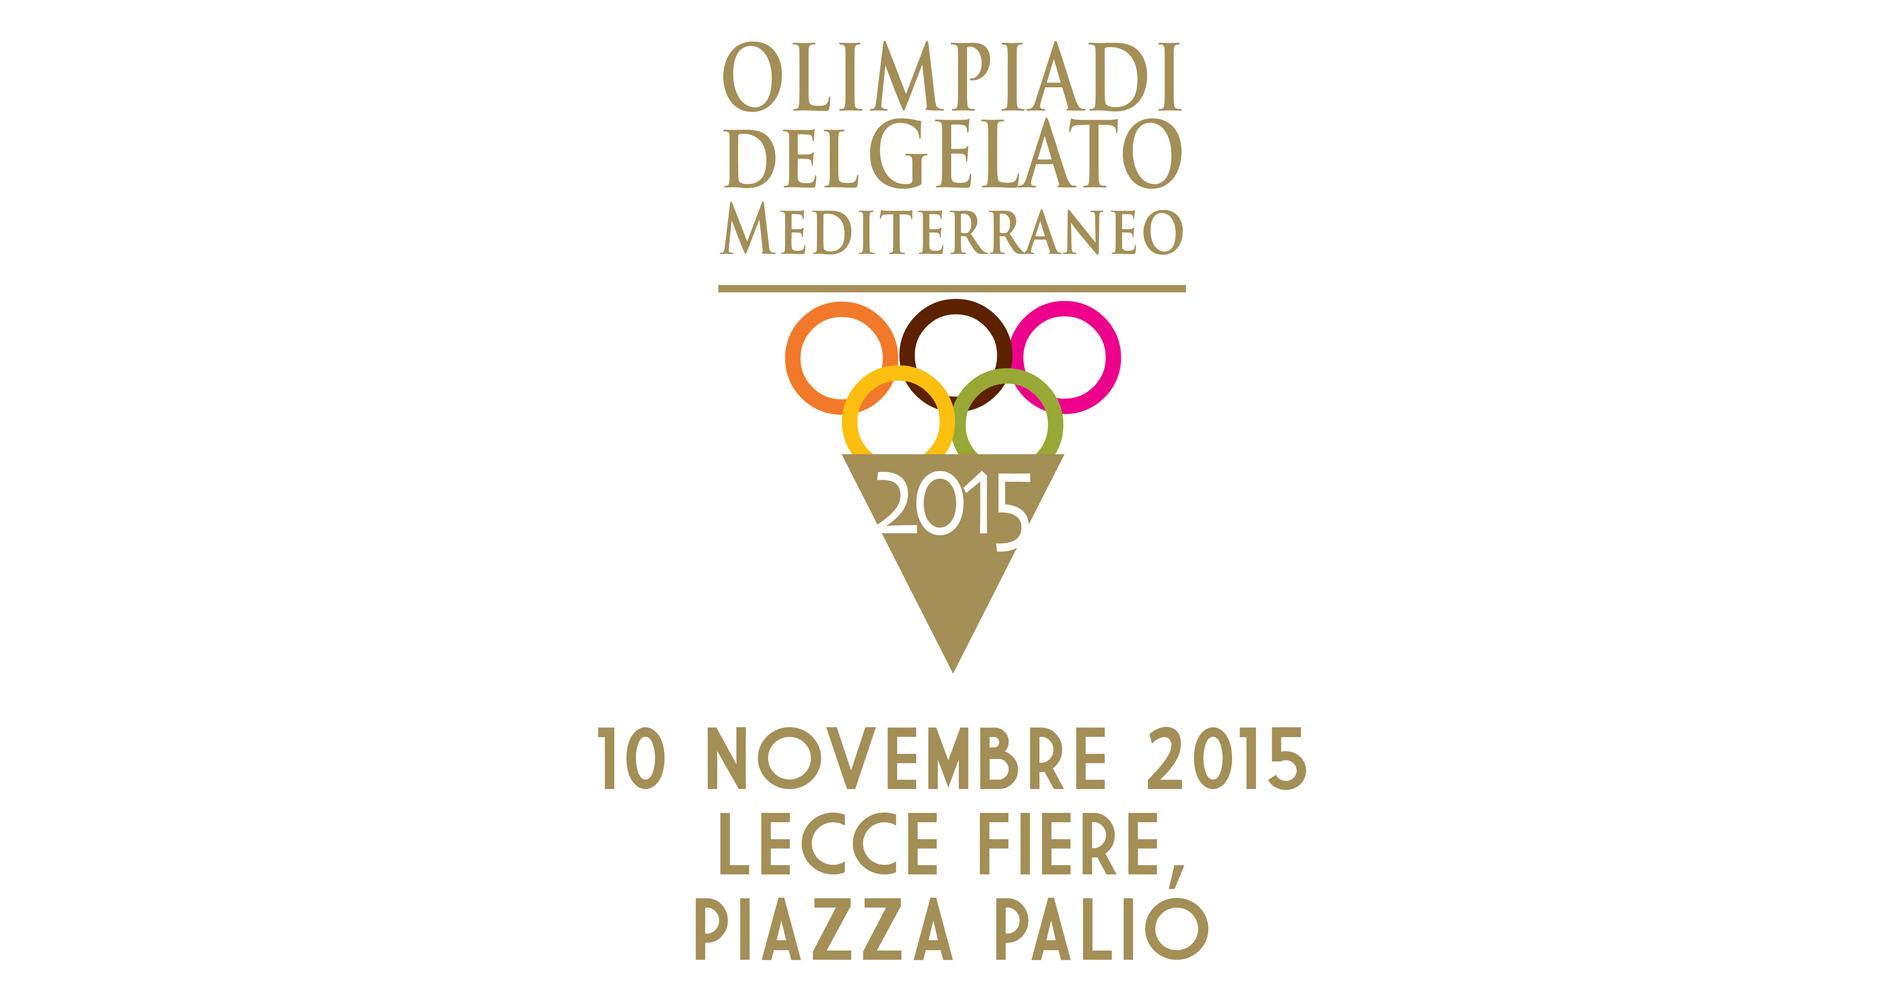 OLIMPIADI DEL GELATO MEDITERRANEO 2015